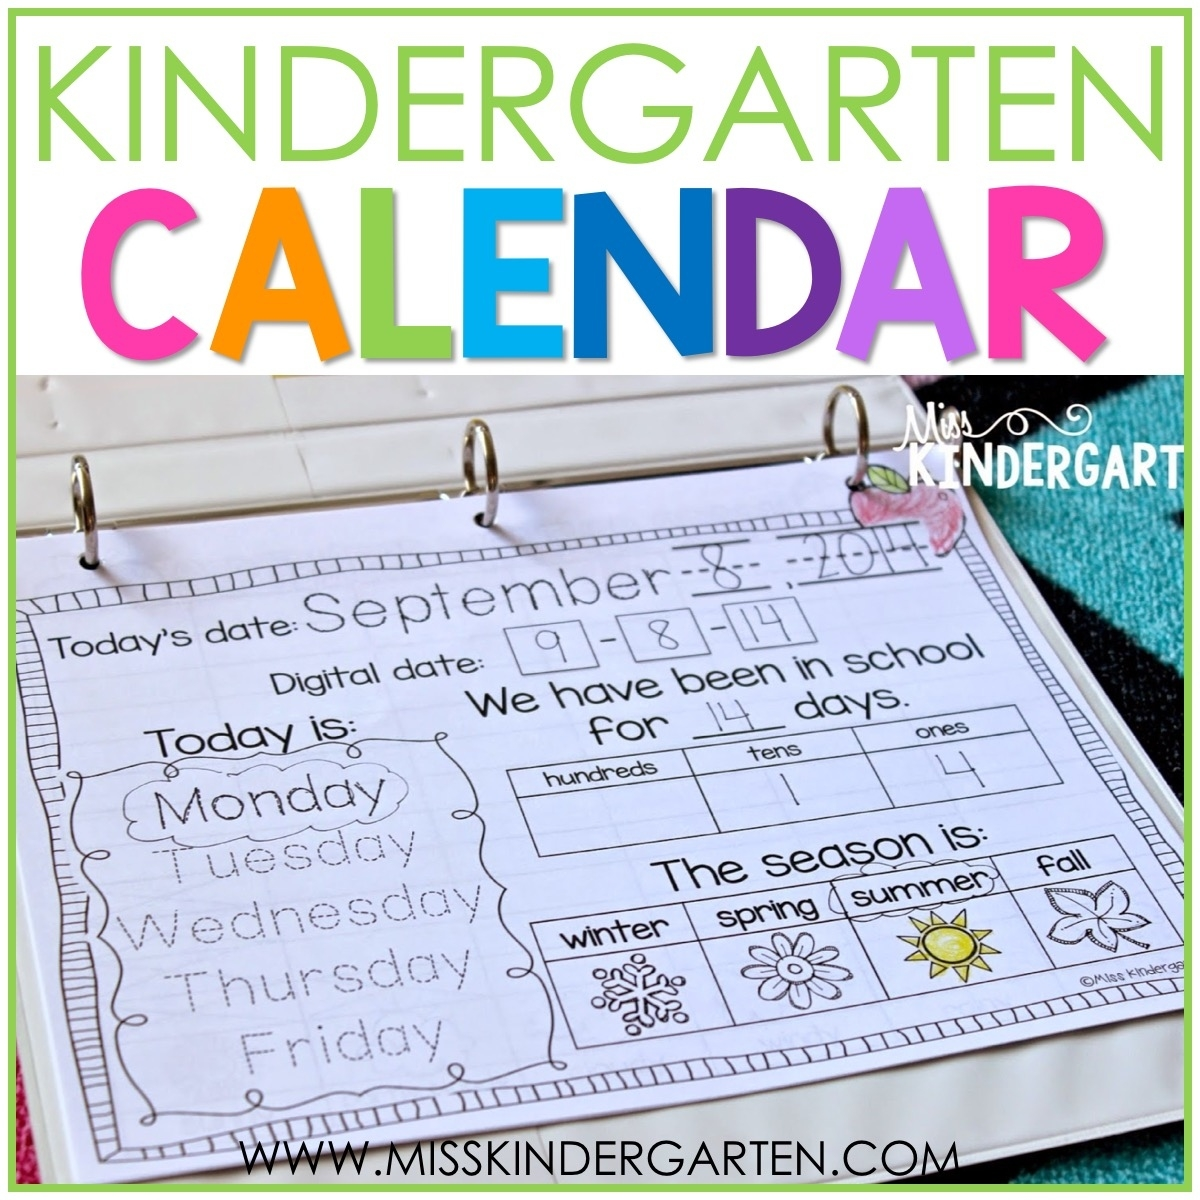 Calendar Time In Kindergarten - Miss Kindergarten Printable Kindergarten Calendar Template